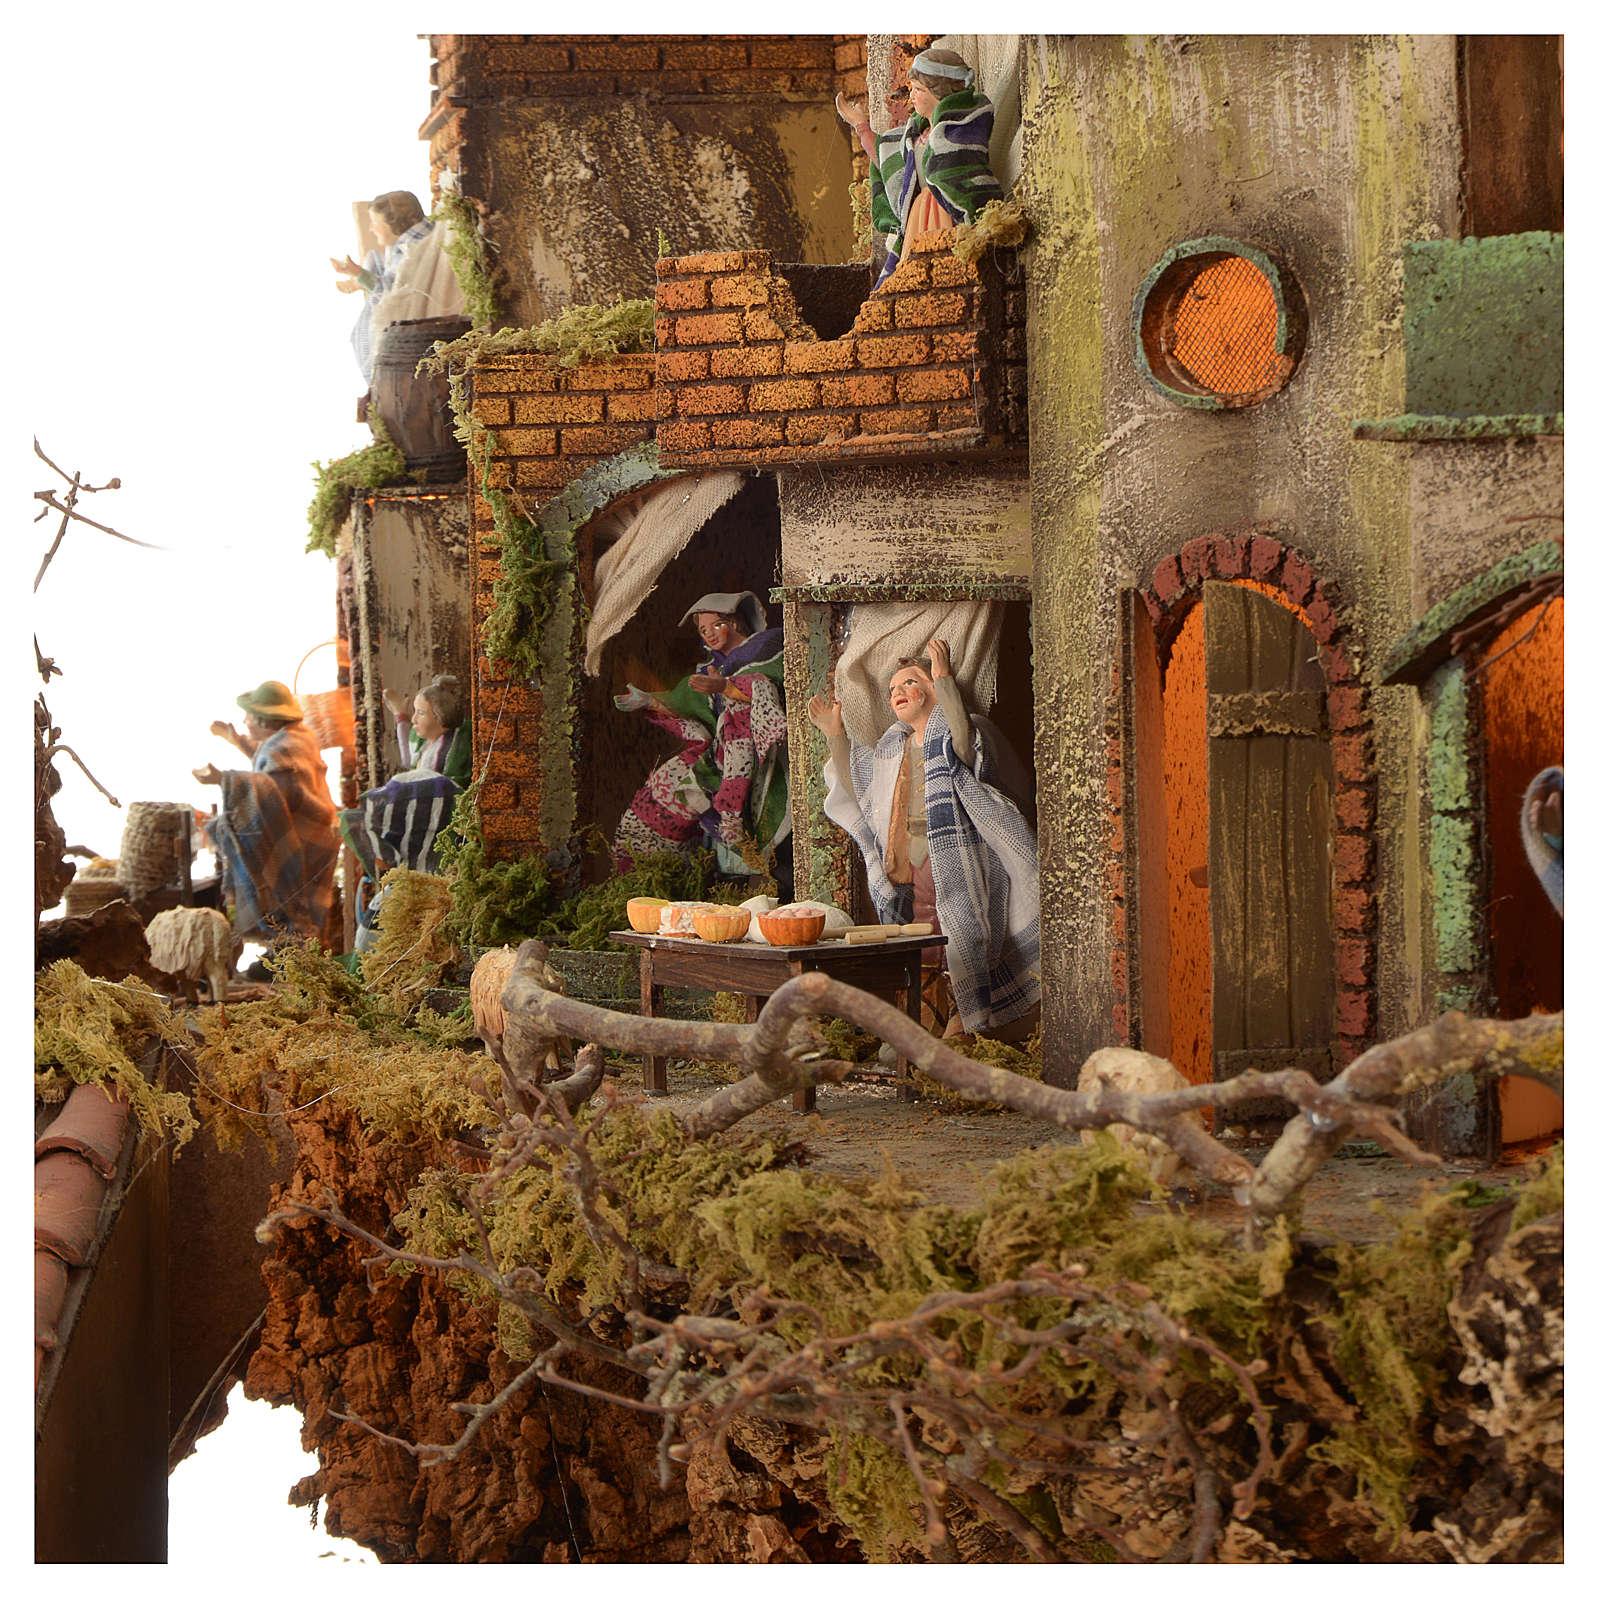 Borgo presepe Napoli mod. C 120X100X100 cm fontana 9 mov 34 pastori - 14 cm 4